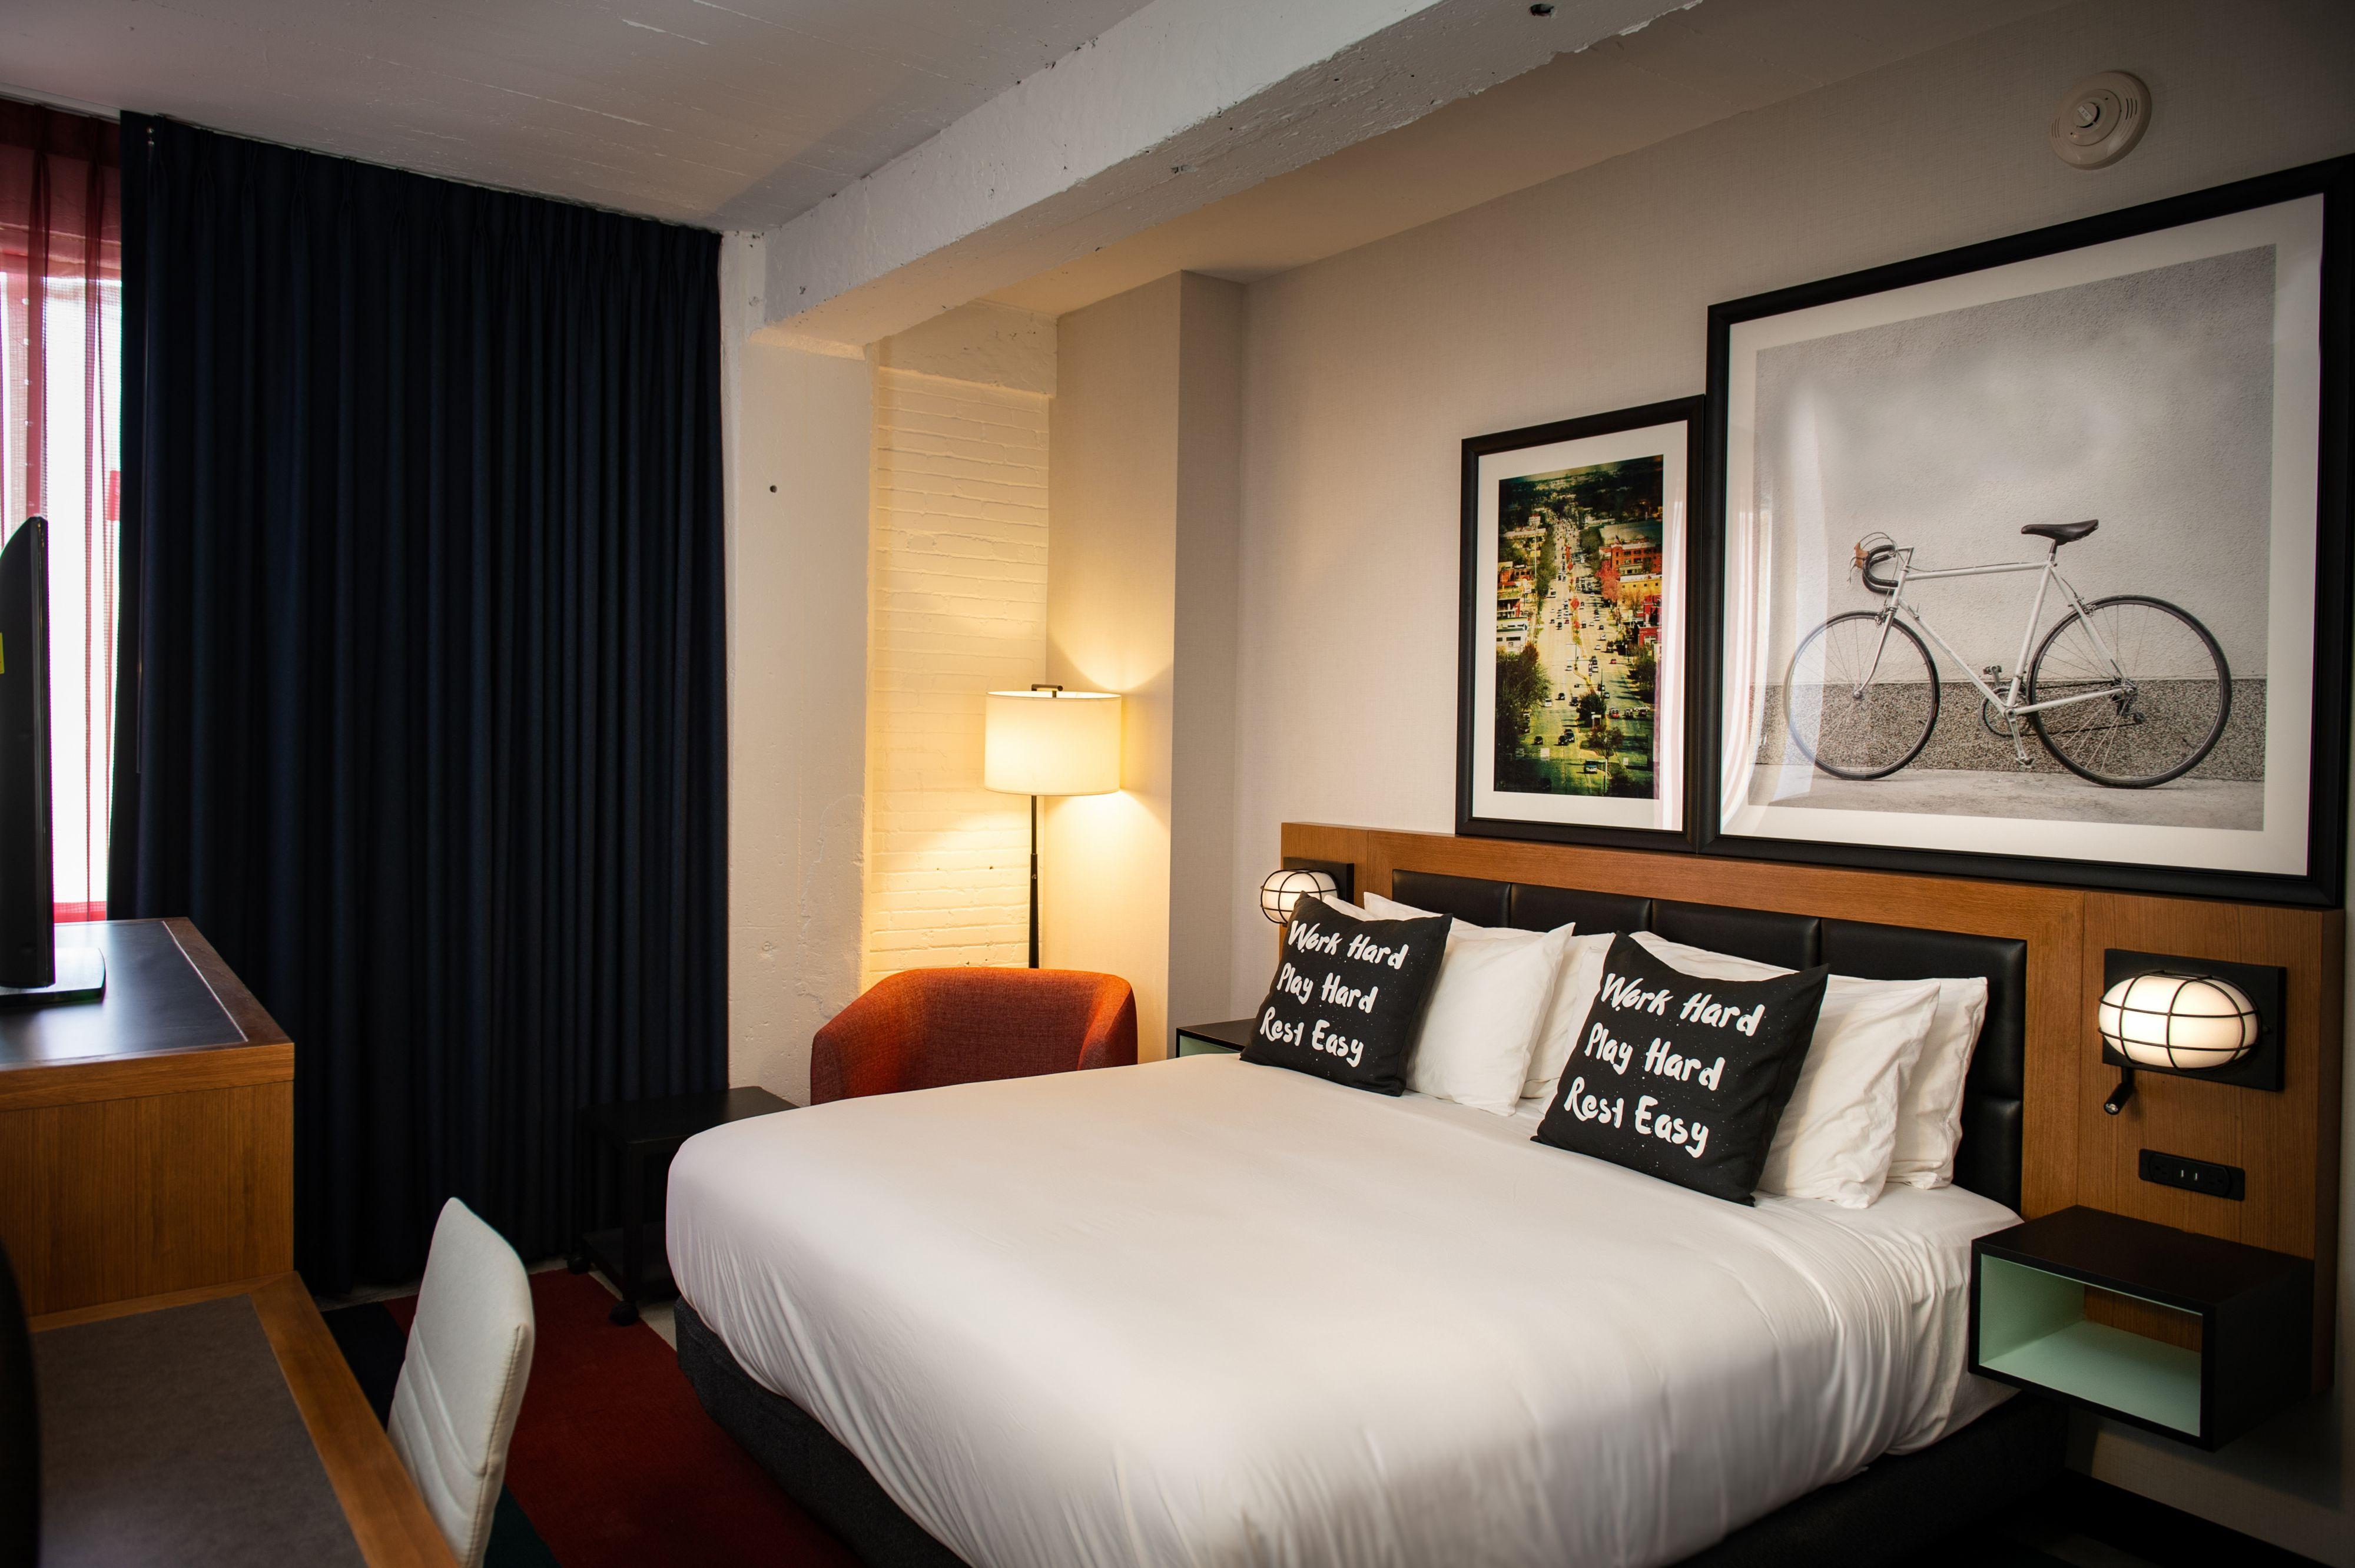 hotel-indigo-madison-5692209740-original.jpg